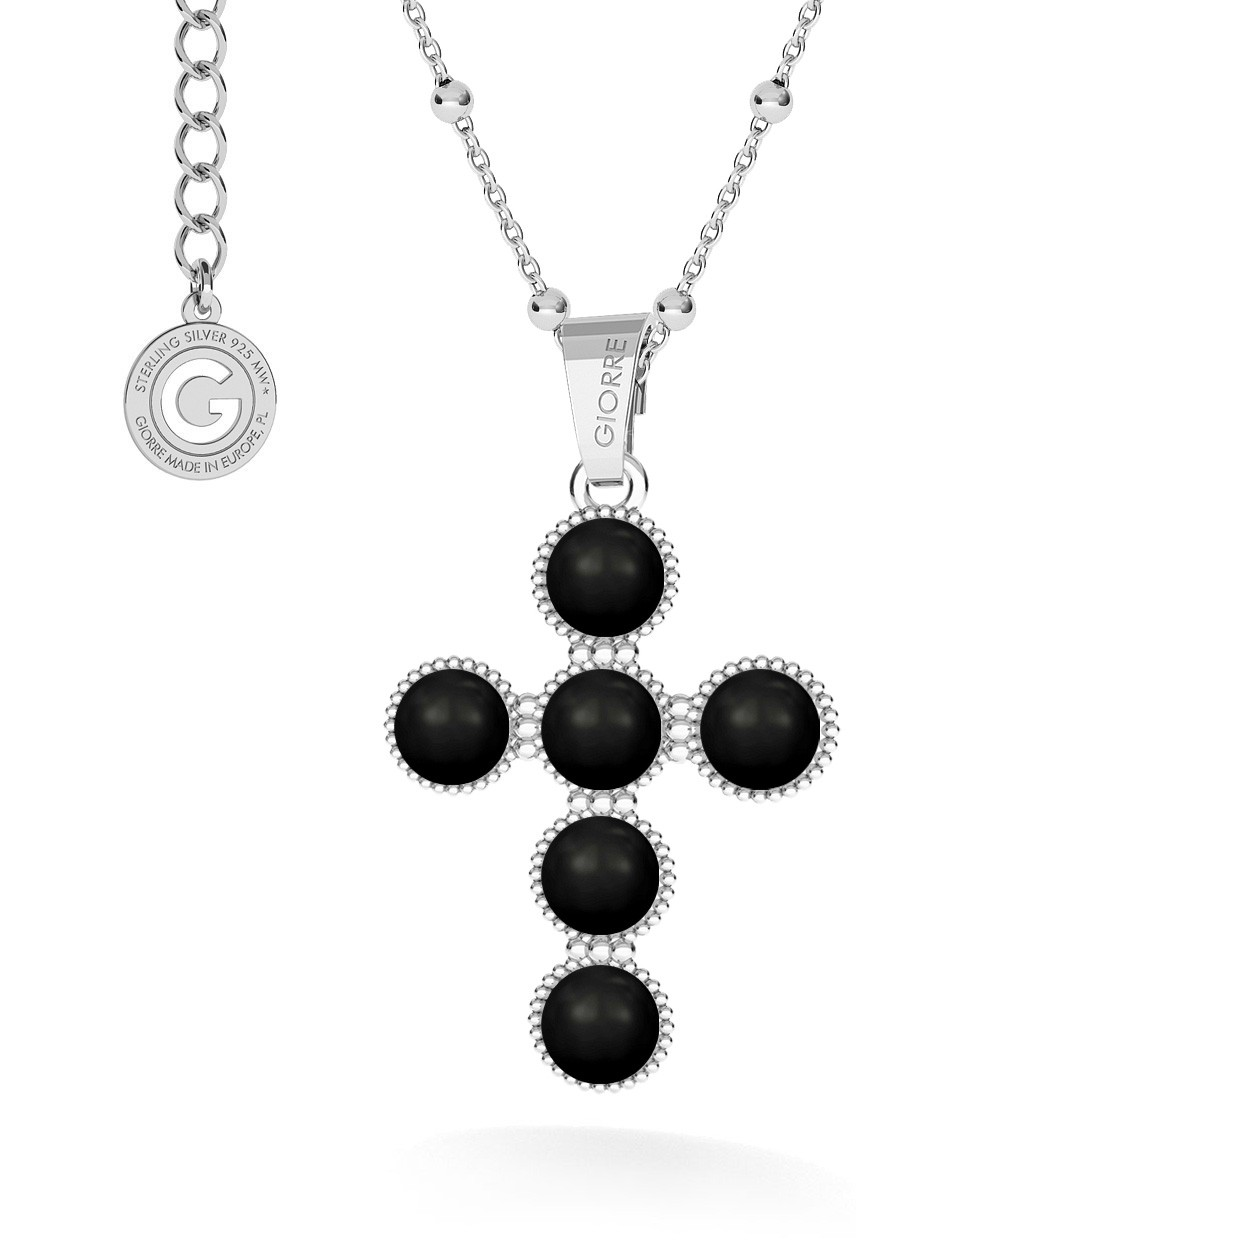 Cross necklace silver 925 & swarovski